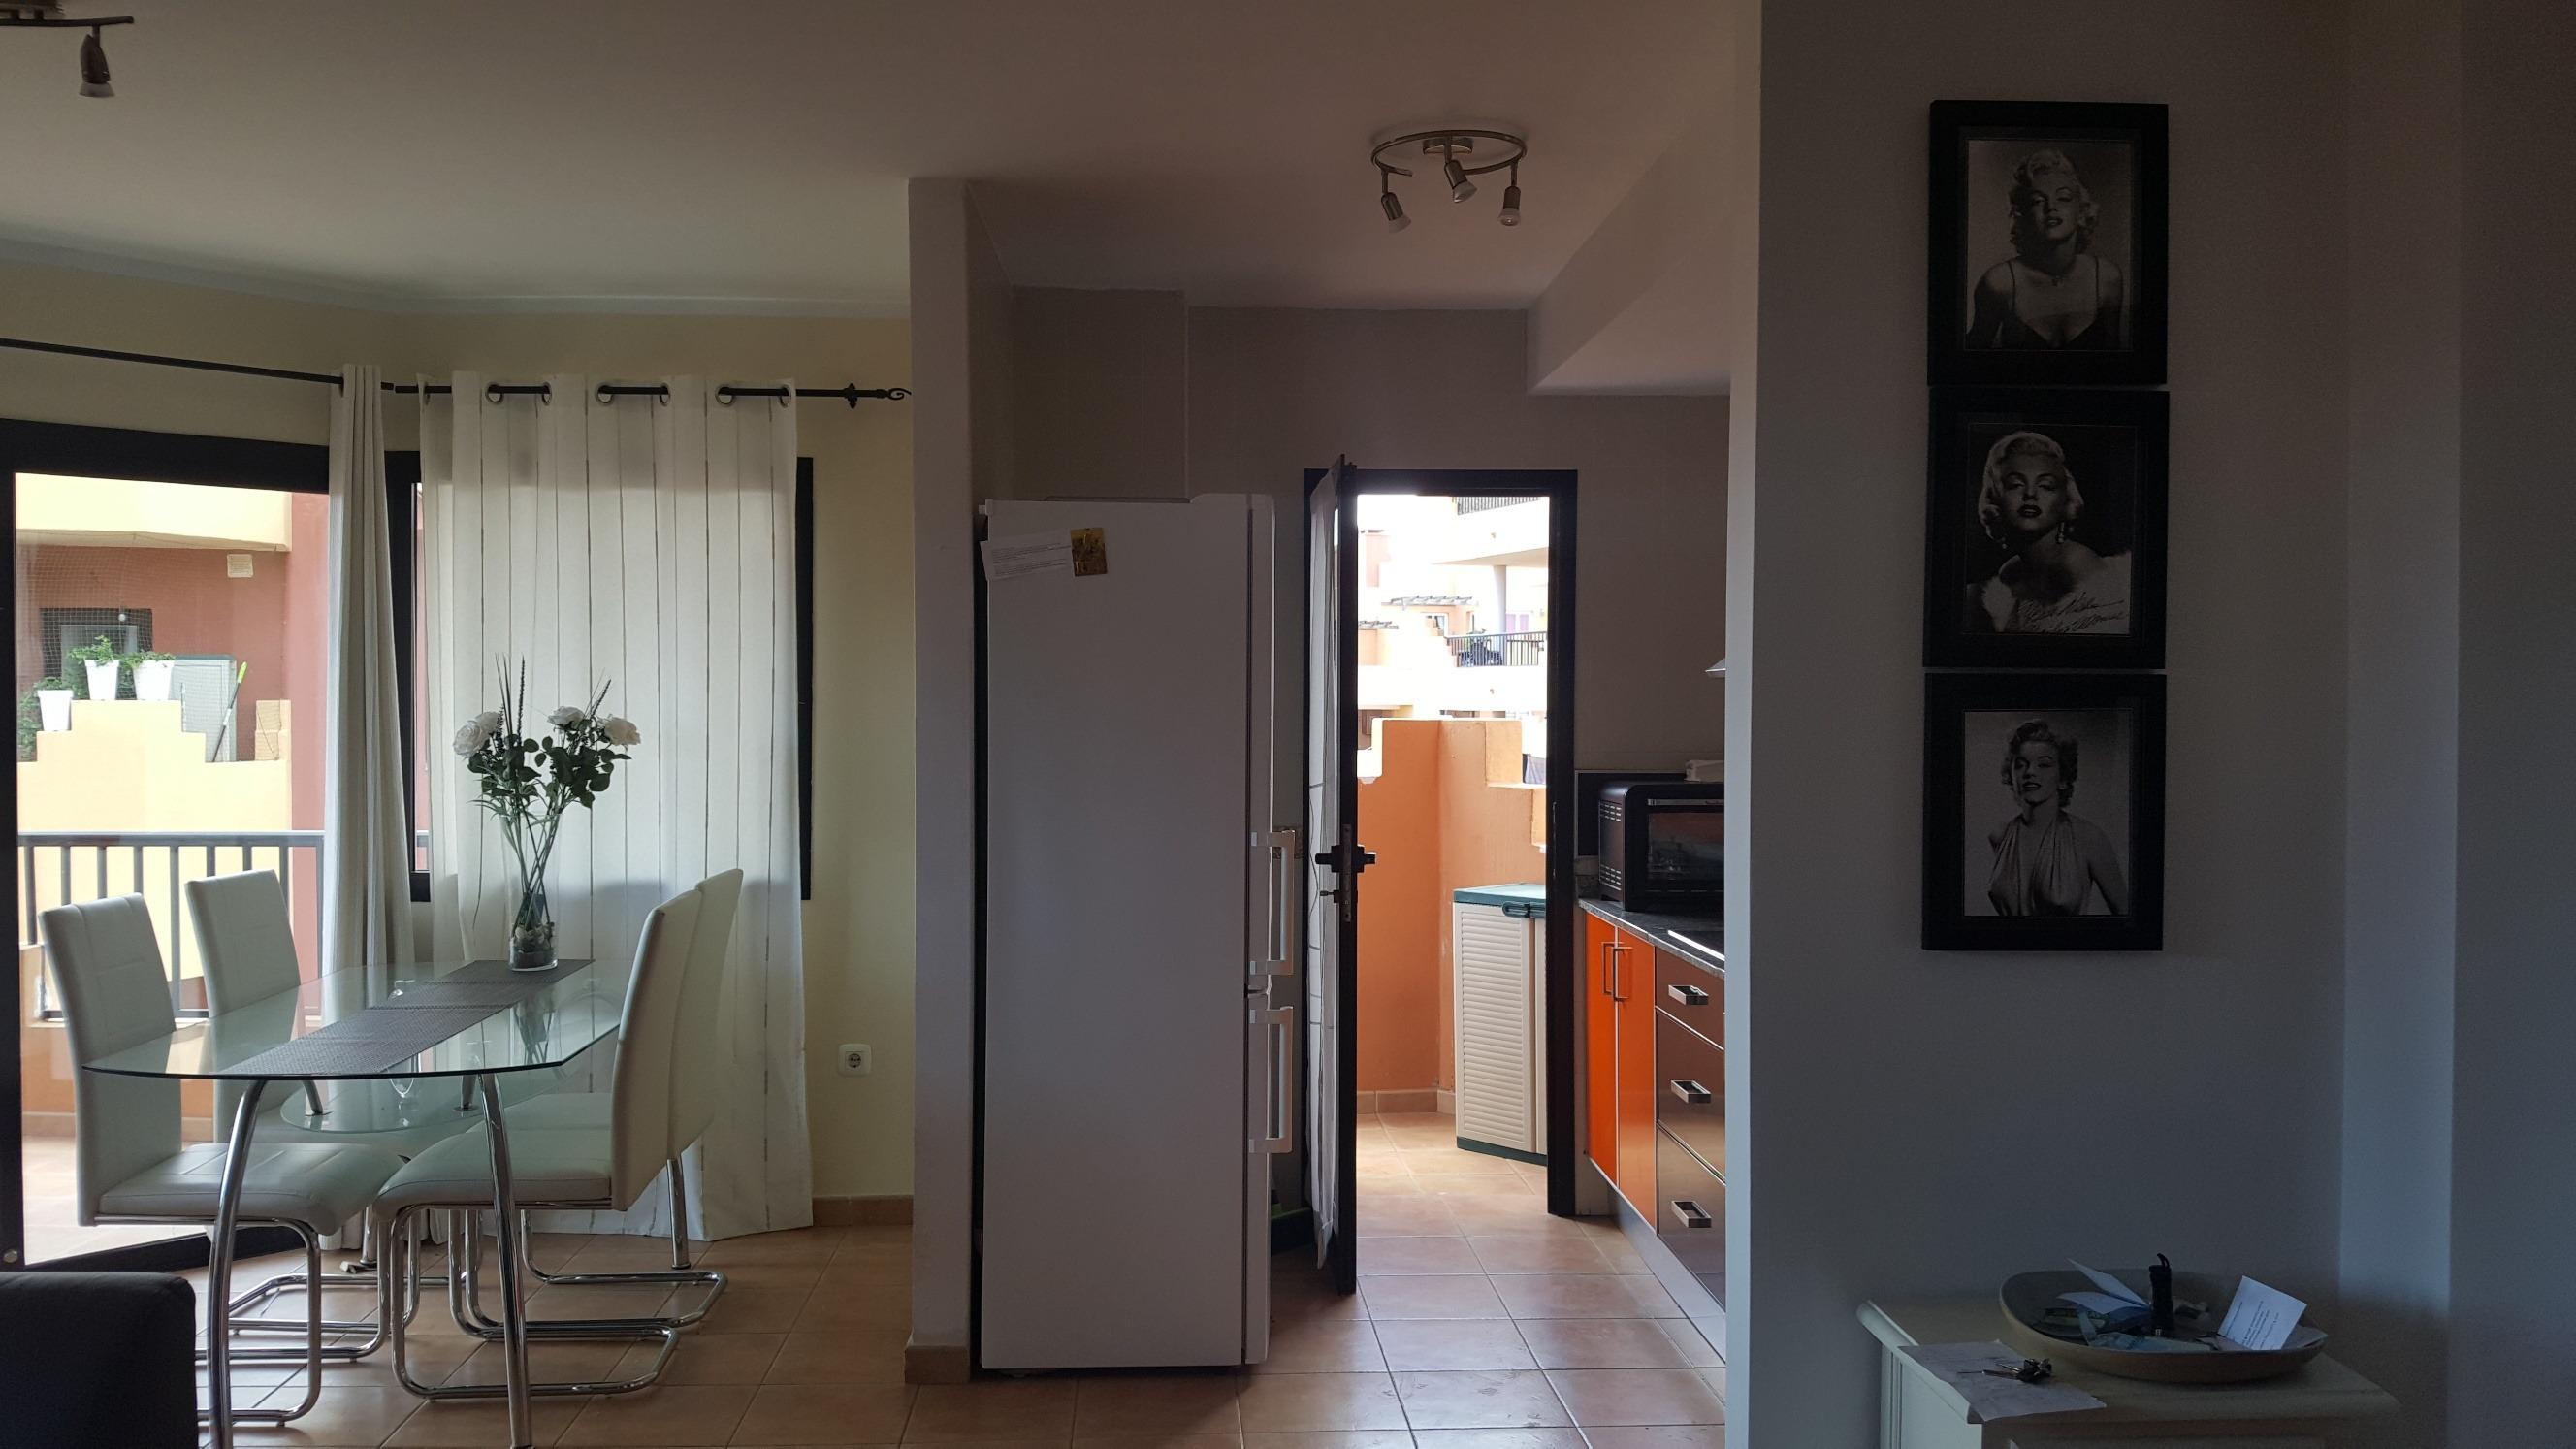 house en for wardrobe propiedad fuerteventura resized topkapi wardrober rent